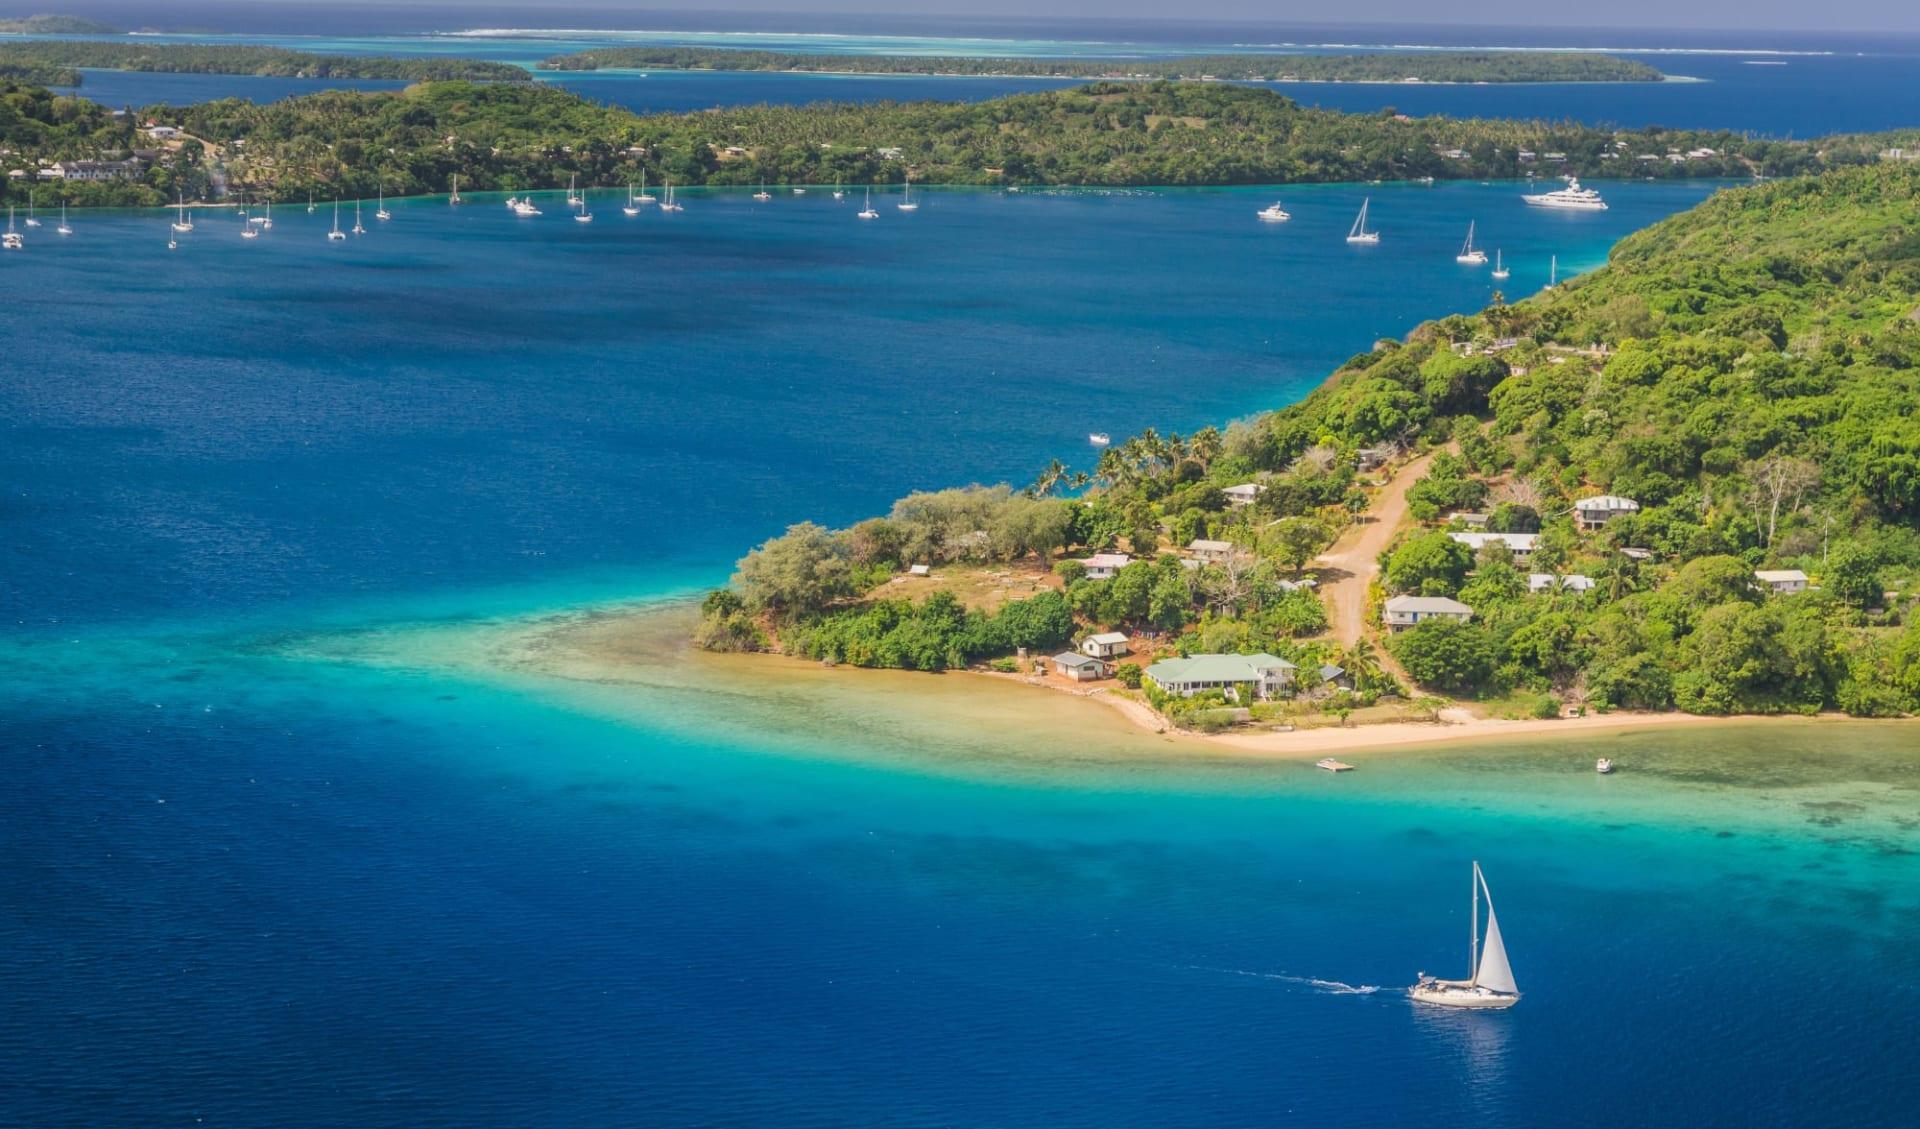 Kreuzfahrt Neuseeland, Fidschi, Samoa und Tonga ab Auckland: Südsee - Tonga - Vogelperspektive - Shutterstock Michael Durinik